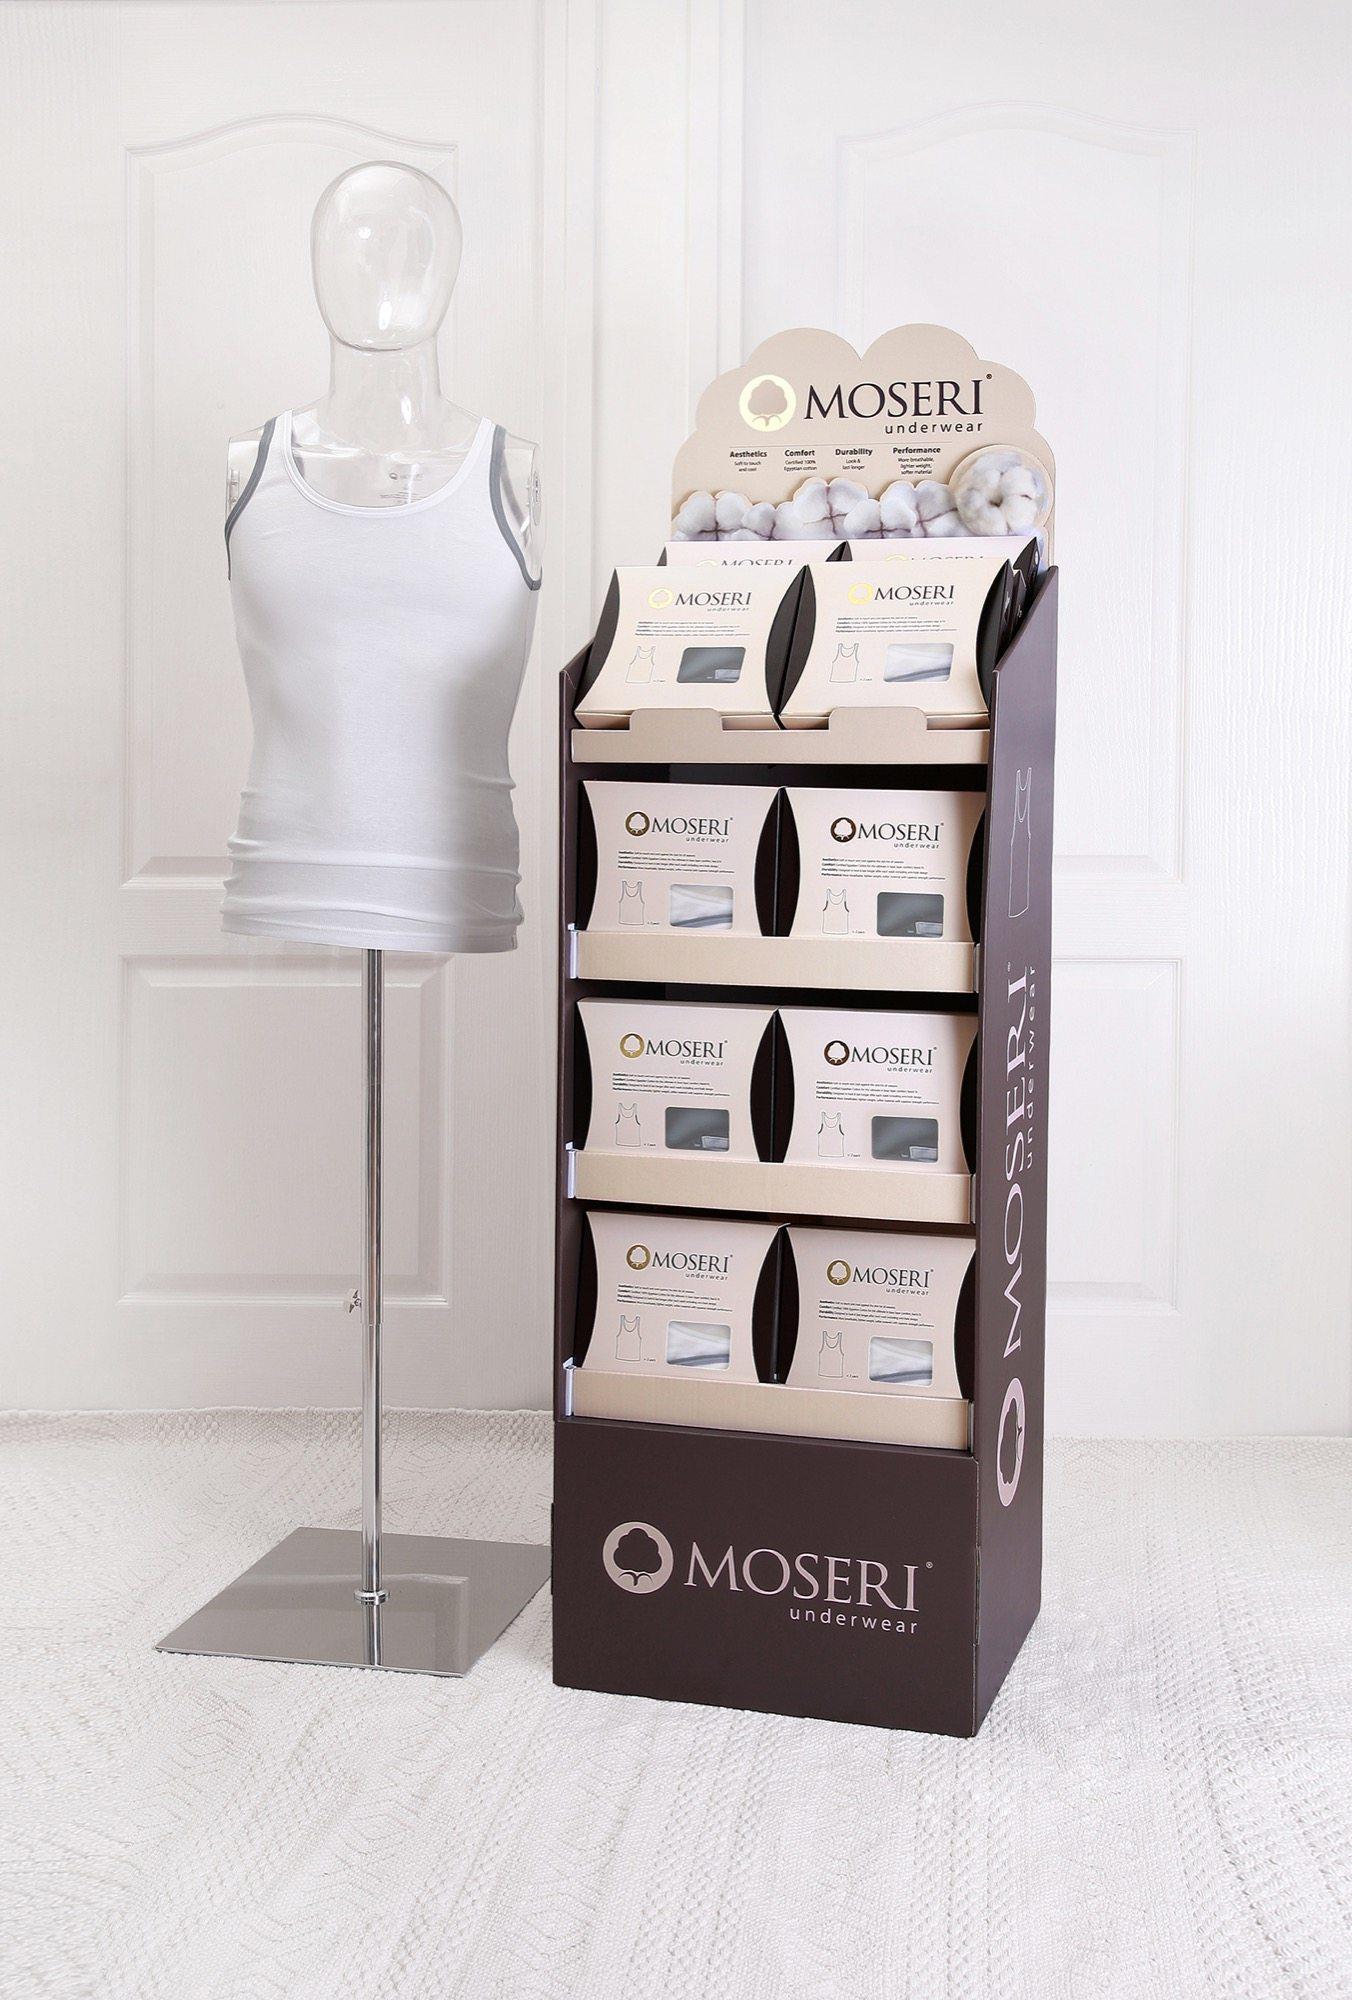 Wholesale - Moseri Underwear